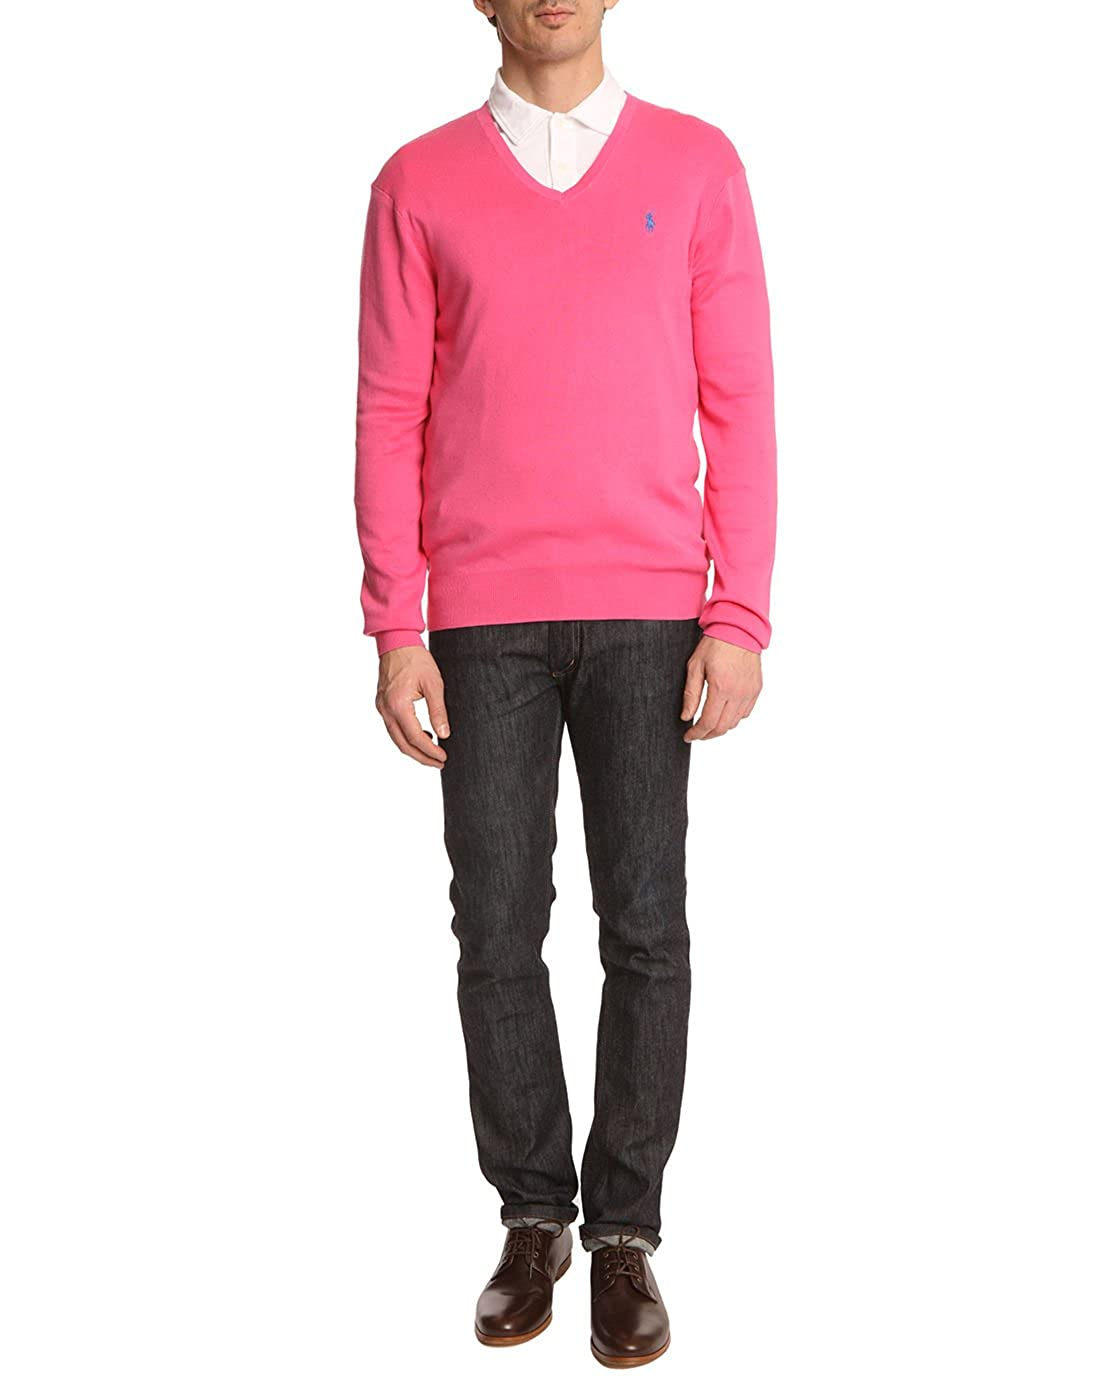 084e383ef4b513 Polo Ralph Lauren Pullover - V-Ausschnitt - Herren - Pullover Slim Fit rosa  Terra für herren - L  Amazon.de  Bekleidung